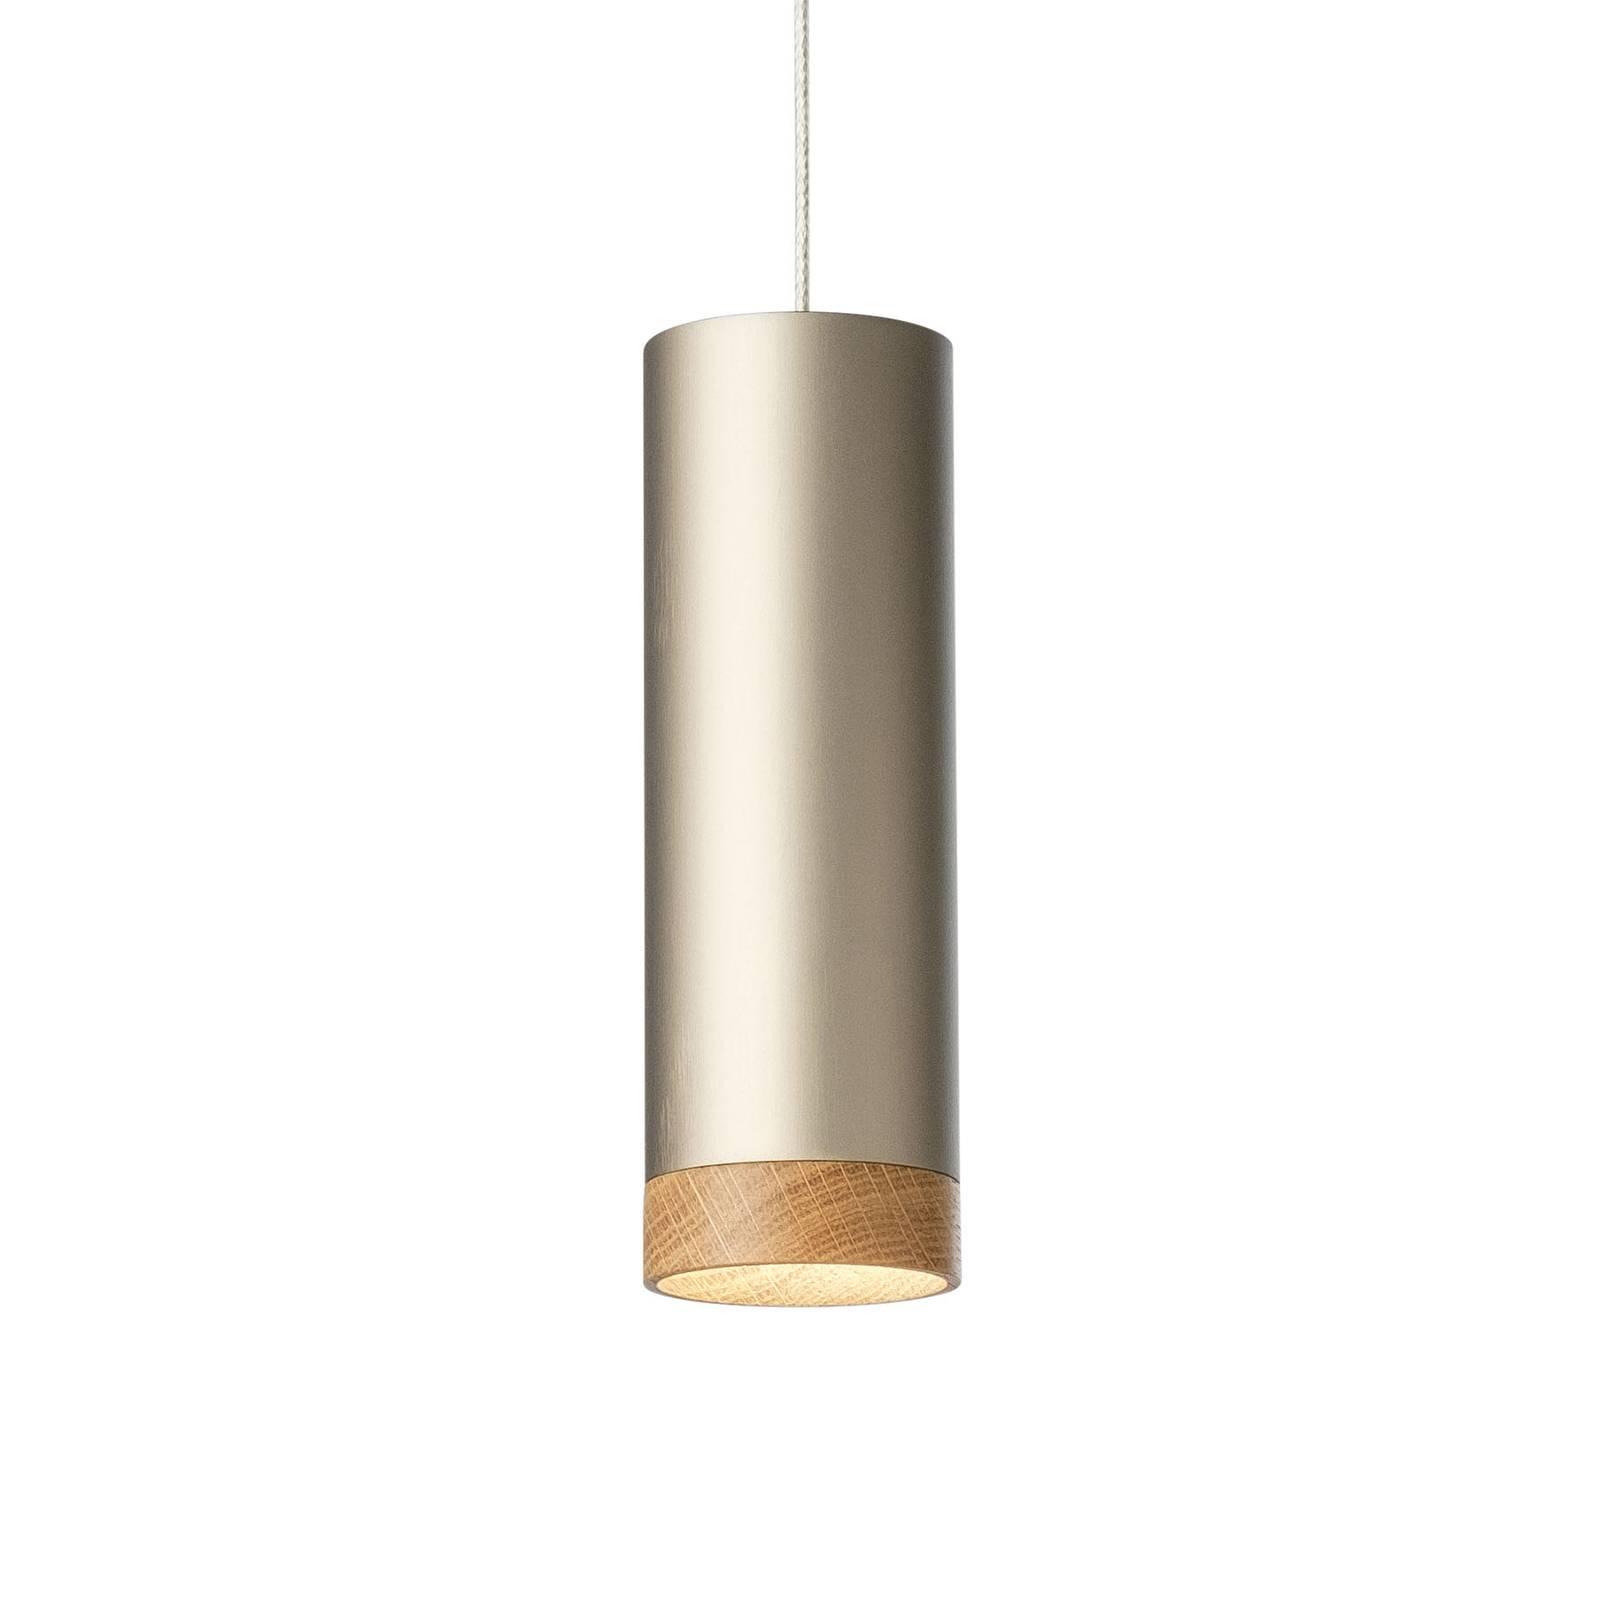 LED-Pendelleuchte PHEB, silberbronze/eiche